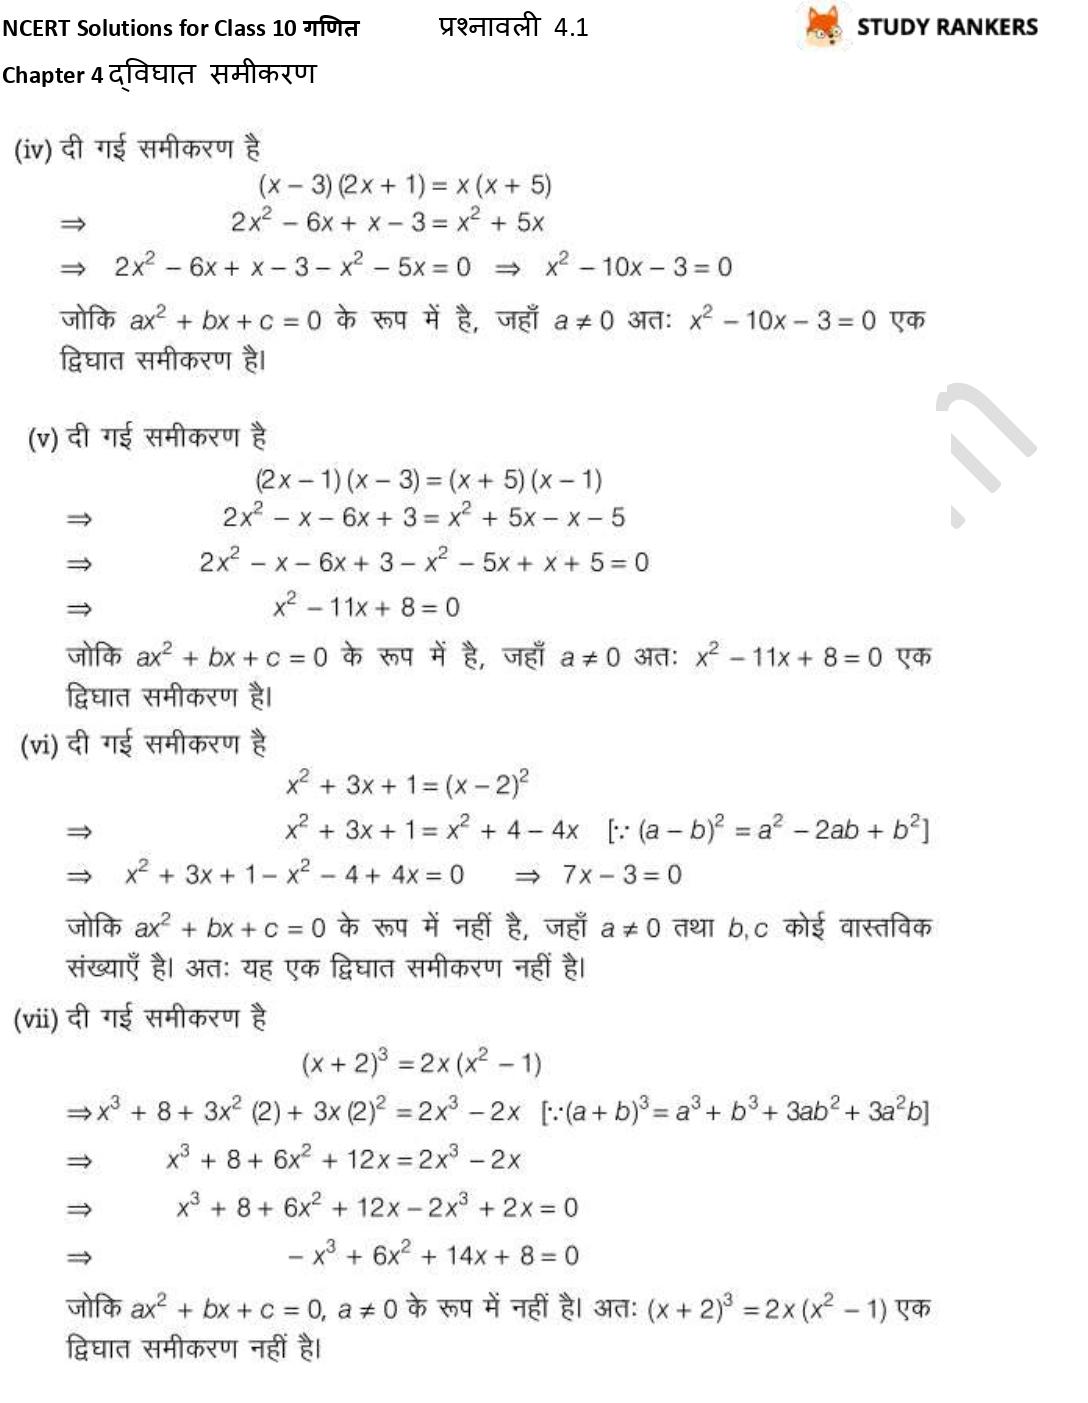 NCERT Solutions for Class 10 Maths Chapter 4 द्विघात समीकरण प्रश्नावली 4.1 Part 2